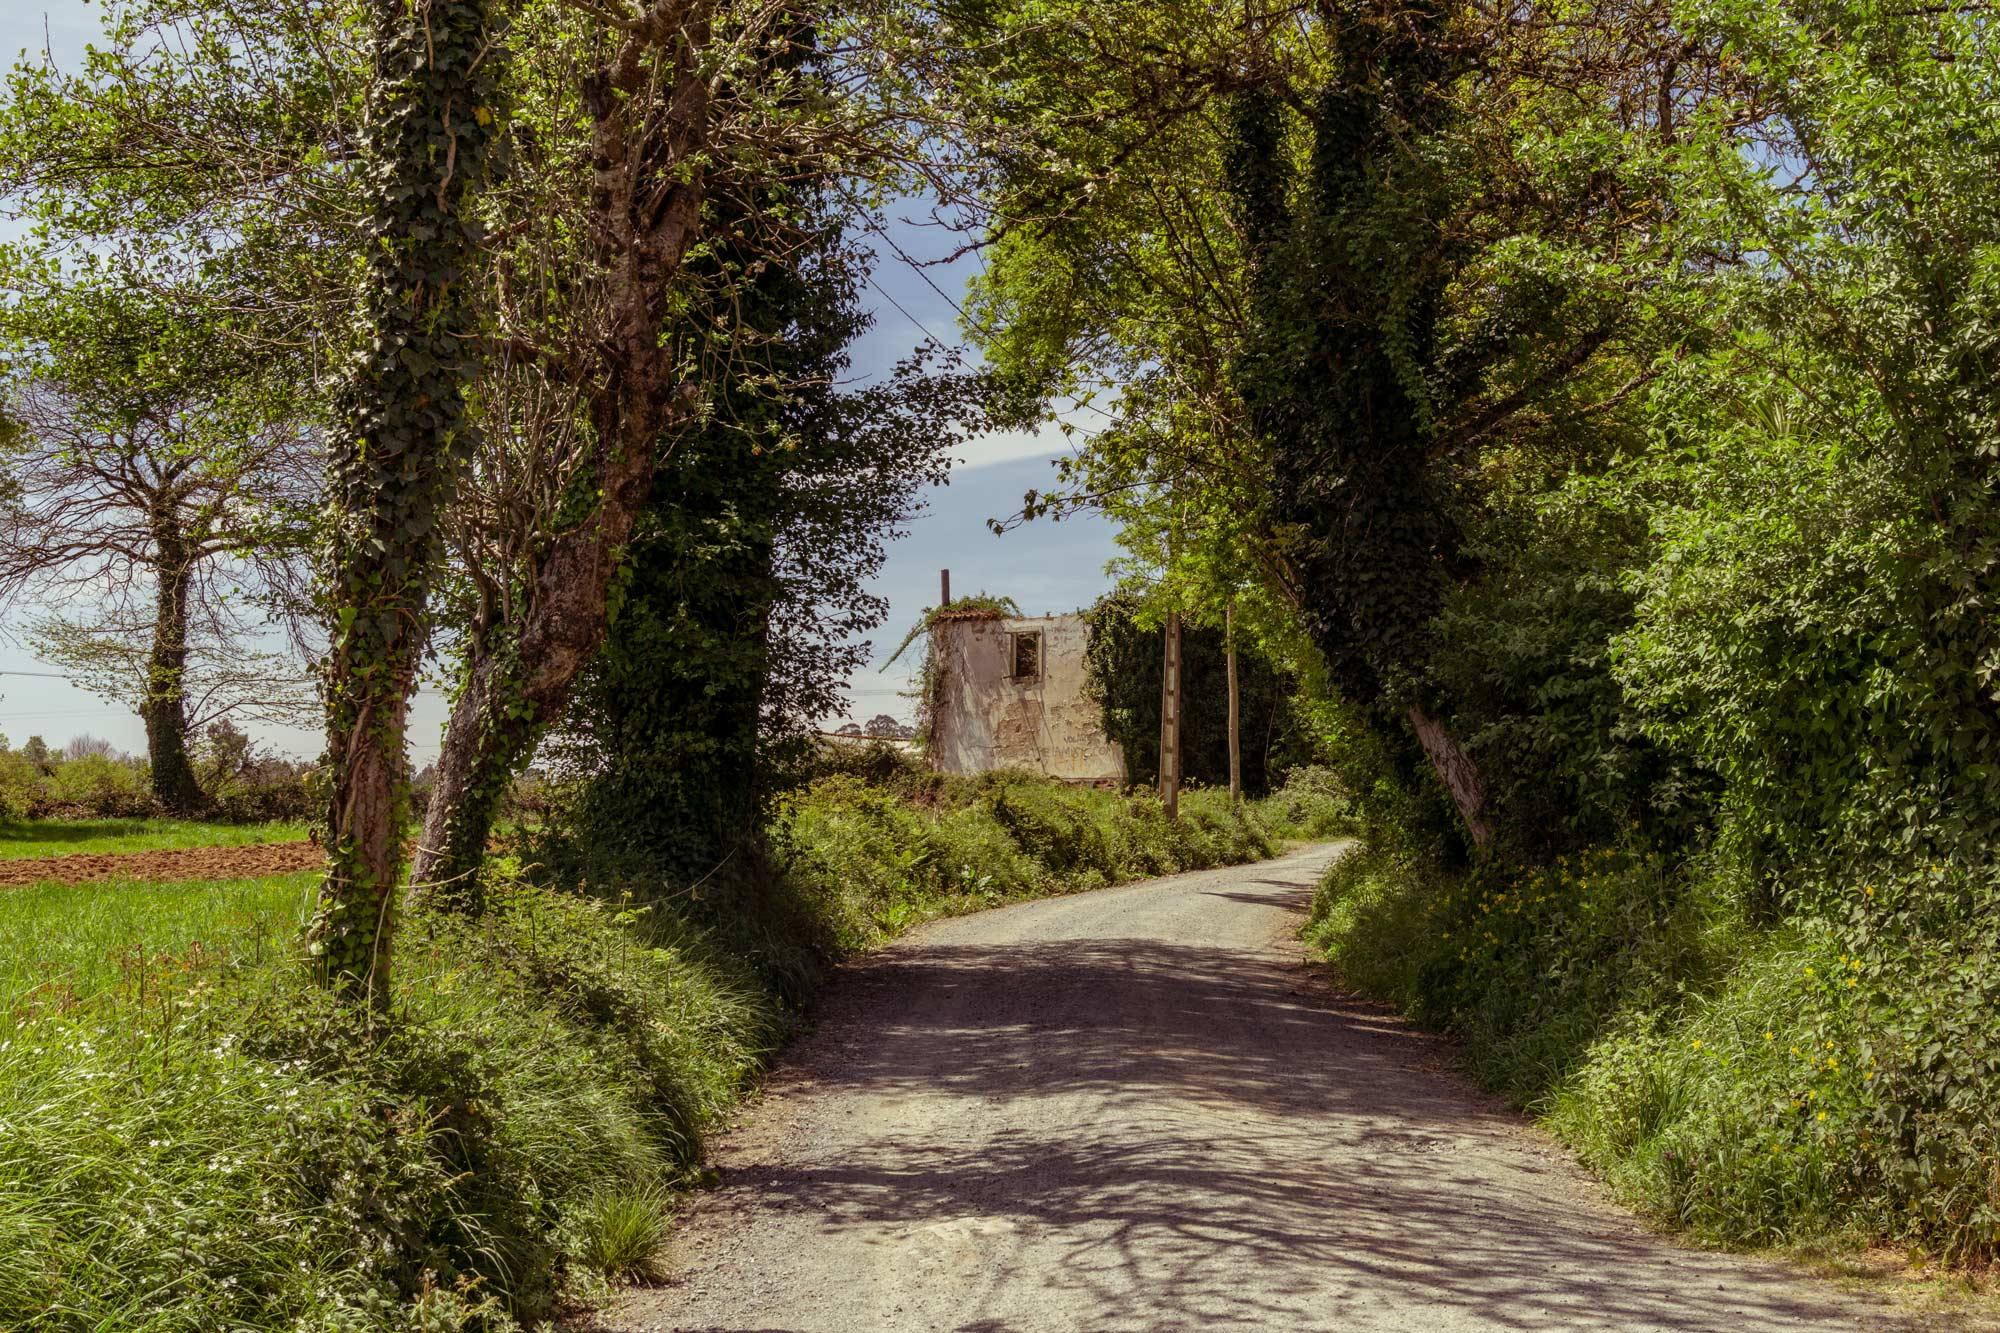 Pilgrimage of Compostela